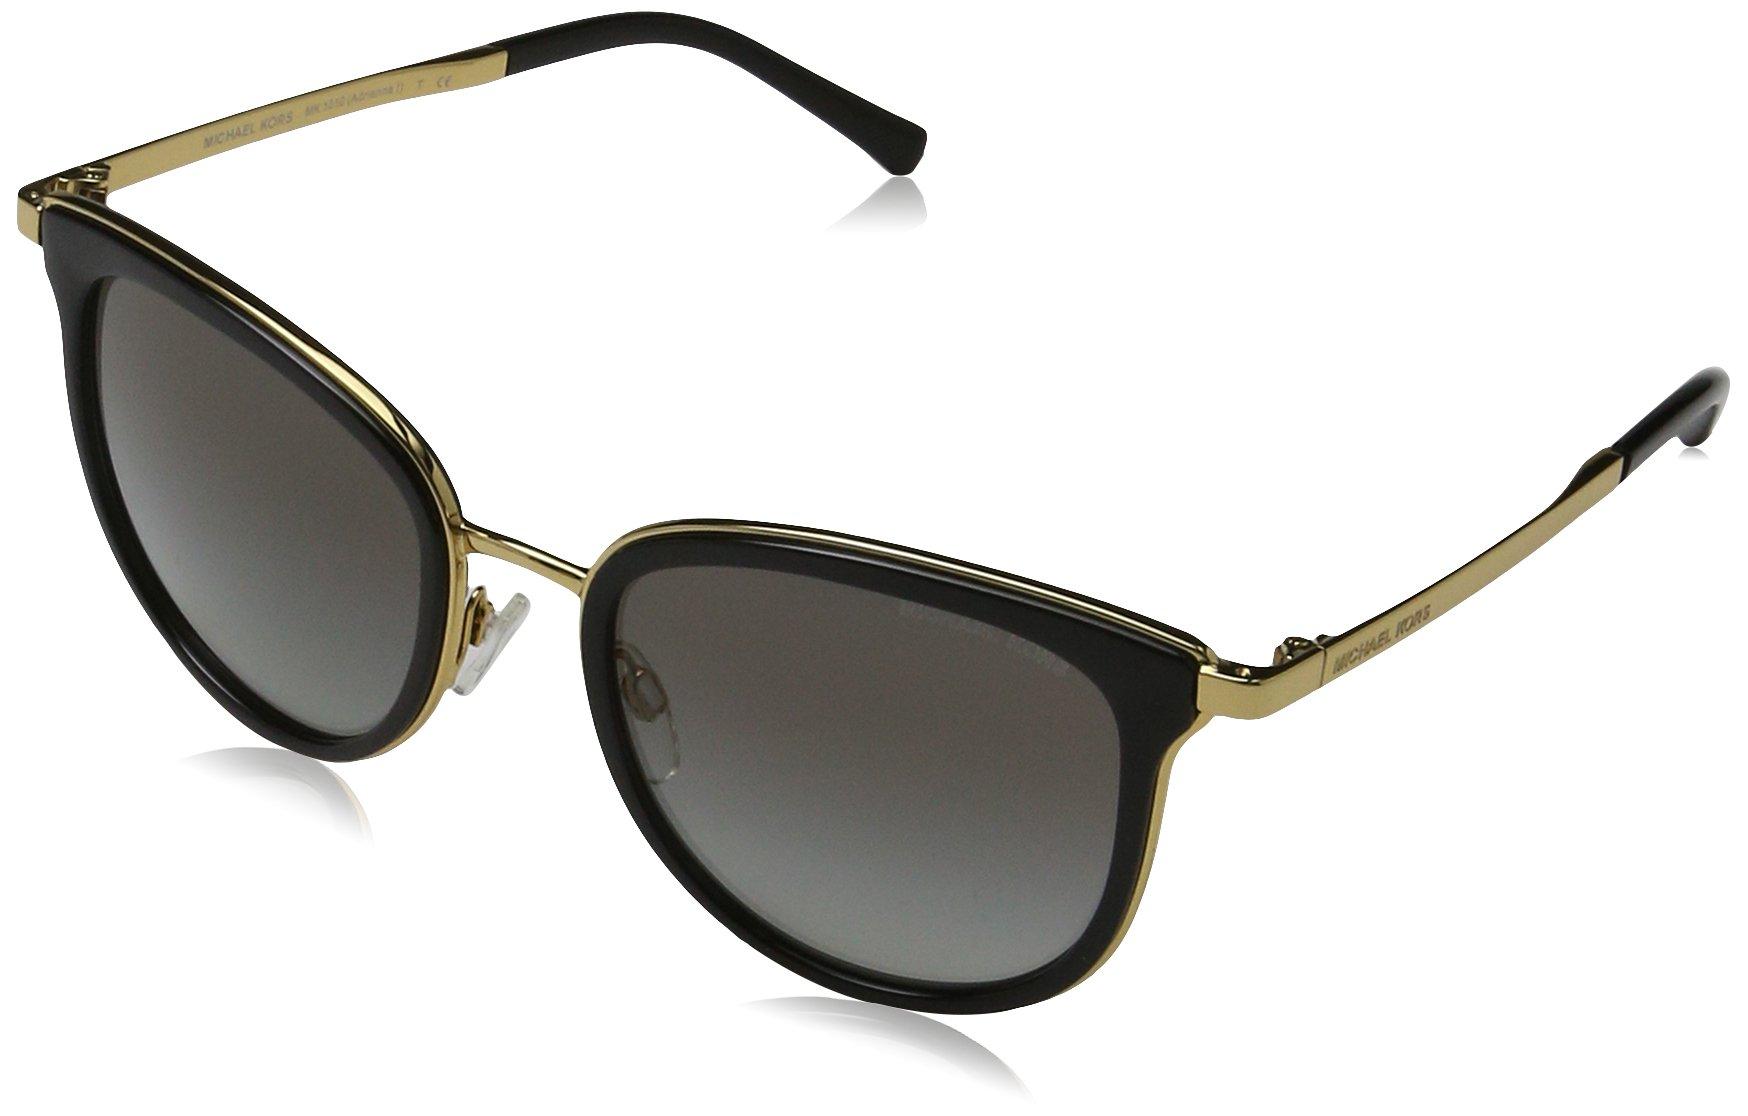 Michael Kors Women's Adrianna I MK1010 Black/Gold Sunglasses by Michael Kors (Image #1)